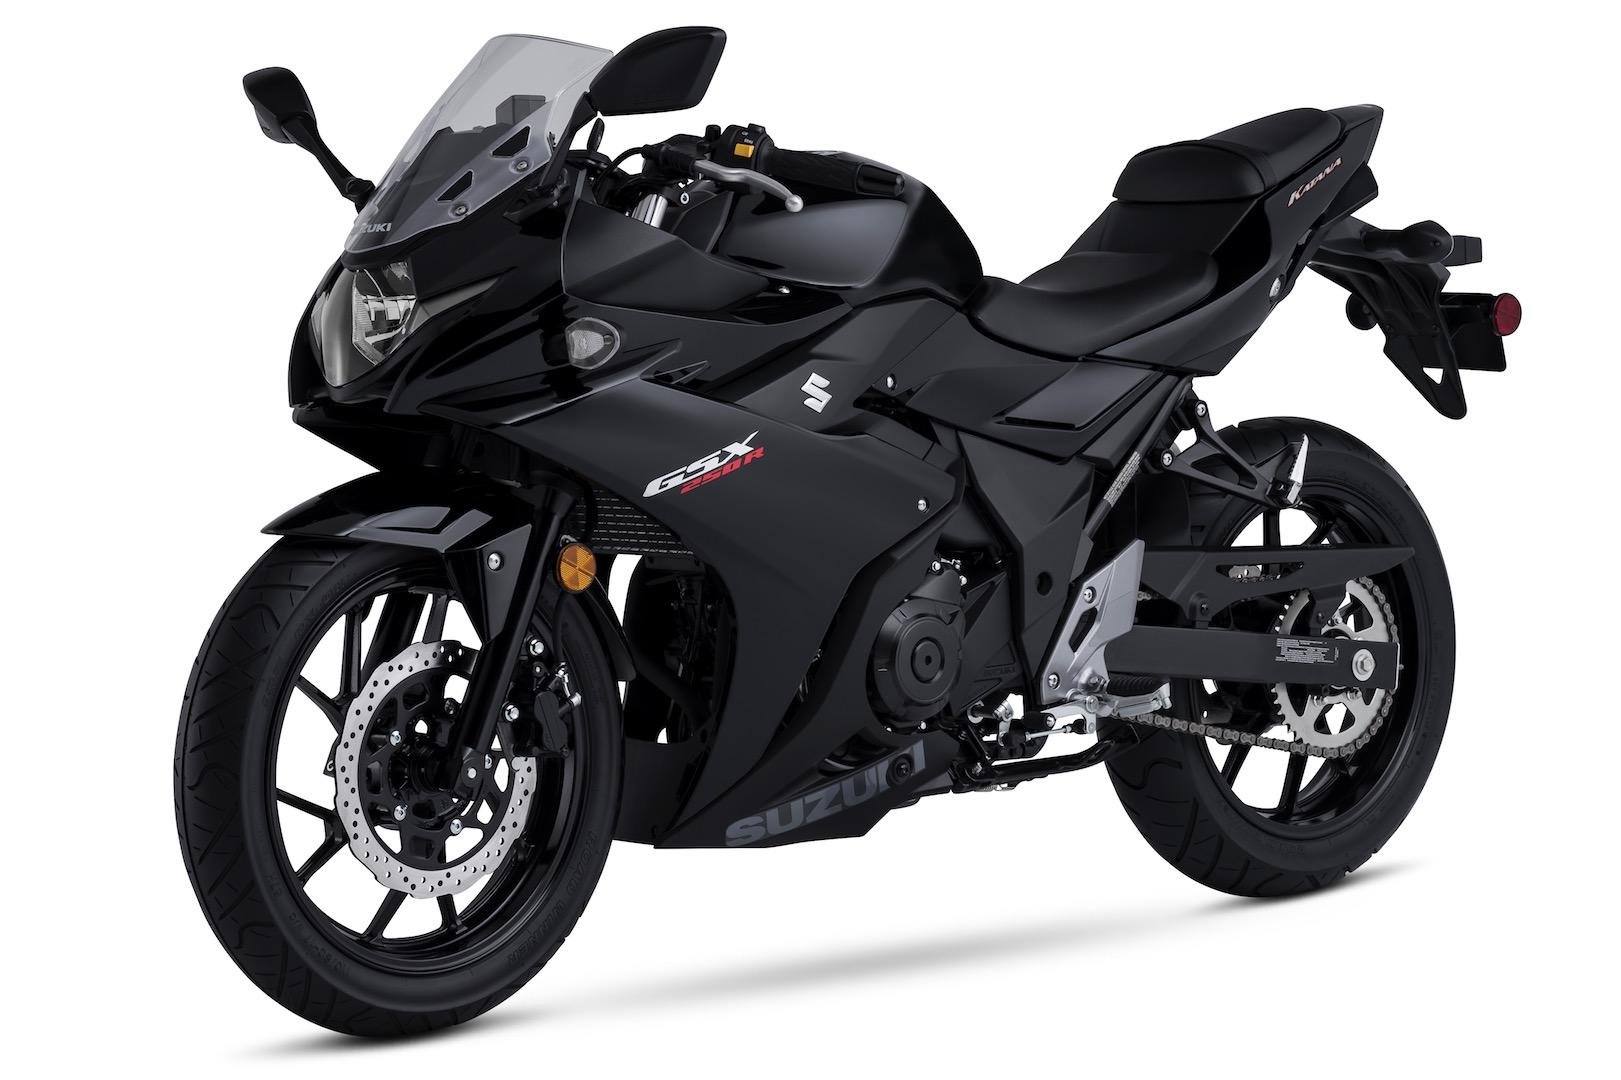 xe moto moi - elle man 4